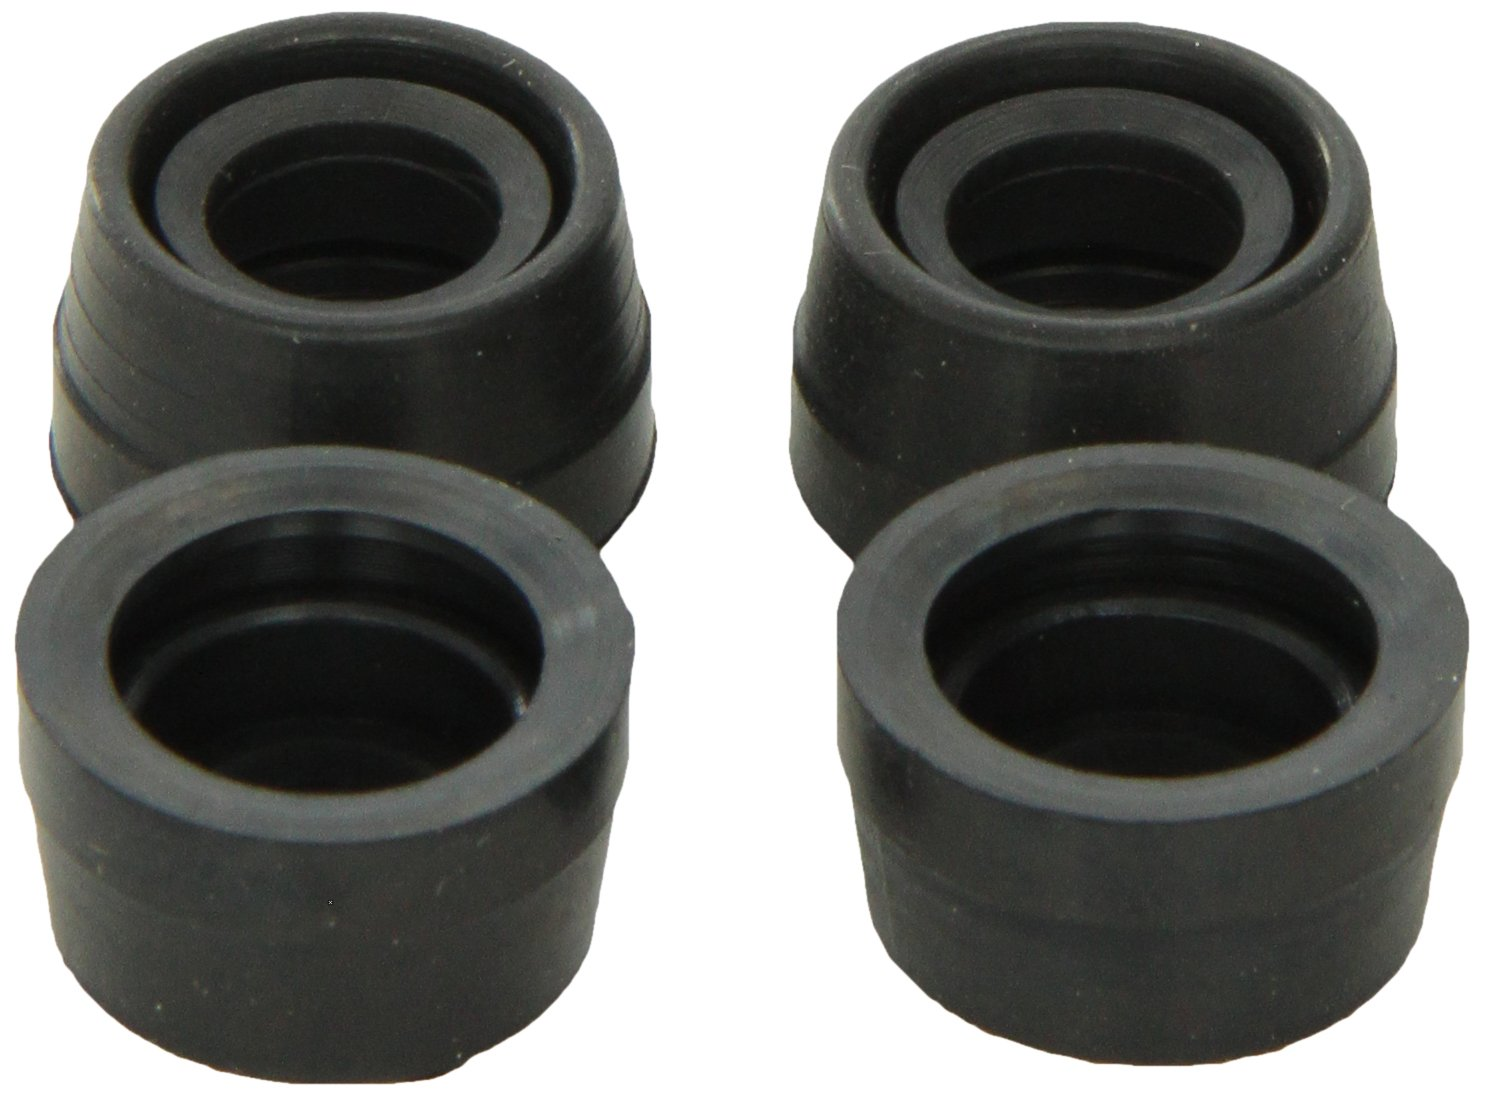 Carlson Quality Brake Parts 16104 Bushing Kit Carlson (CASZC)